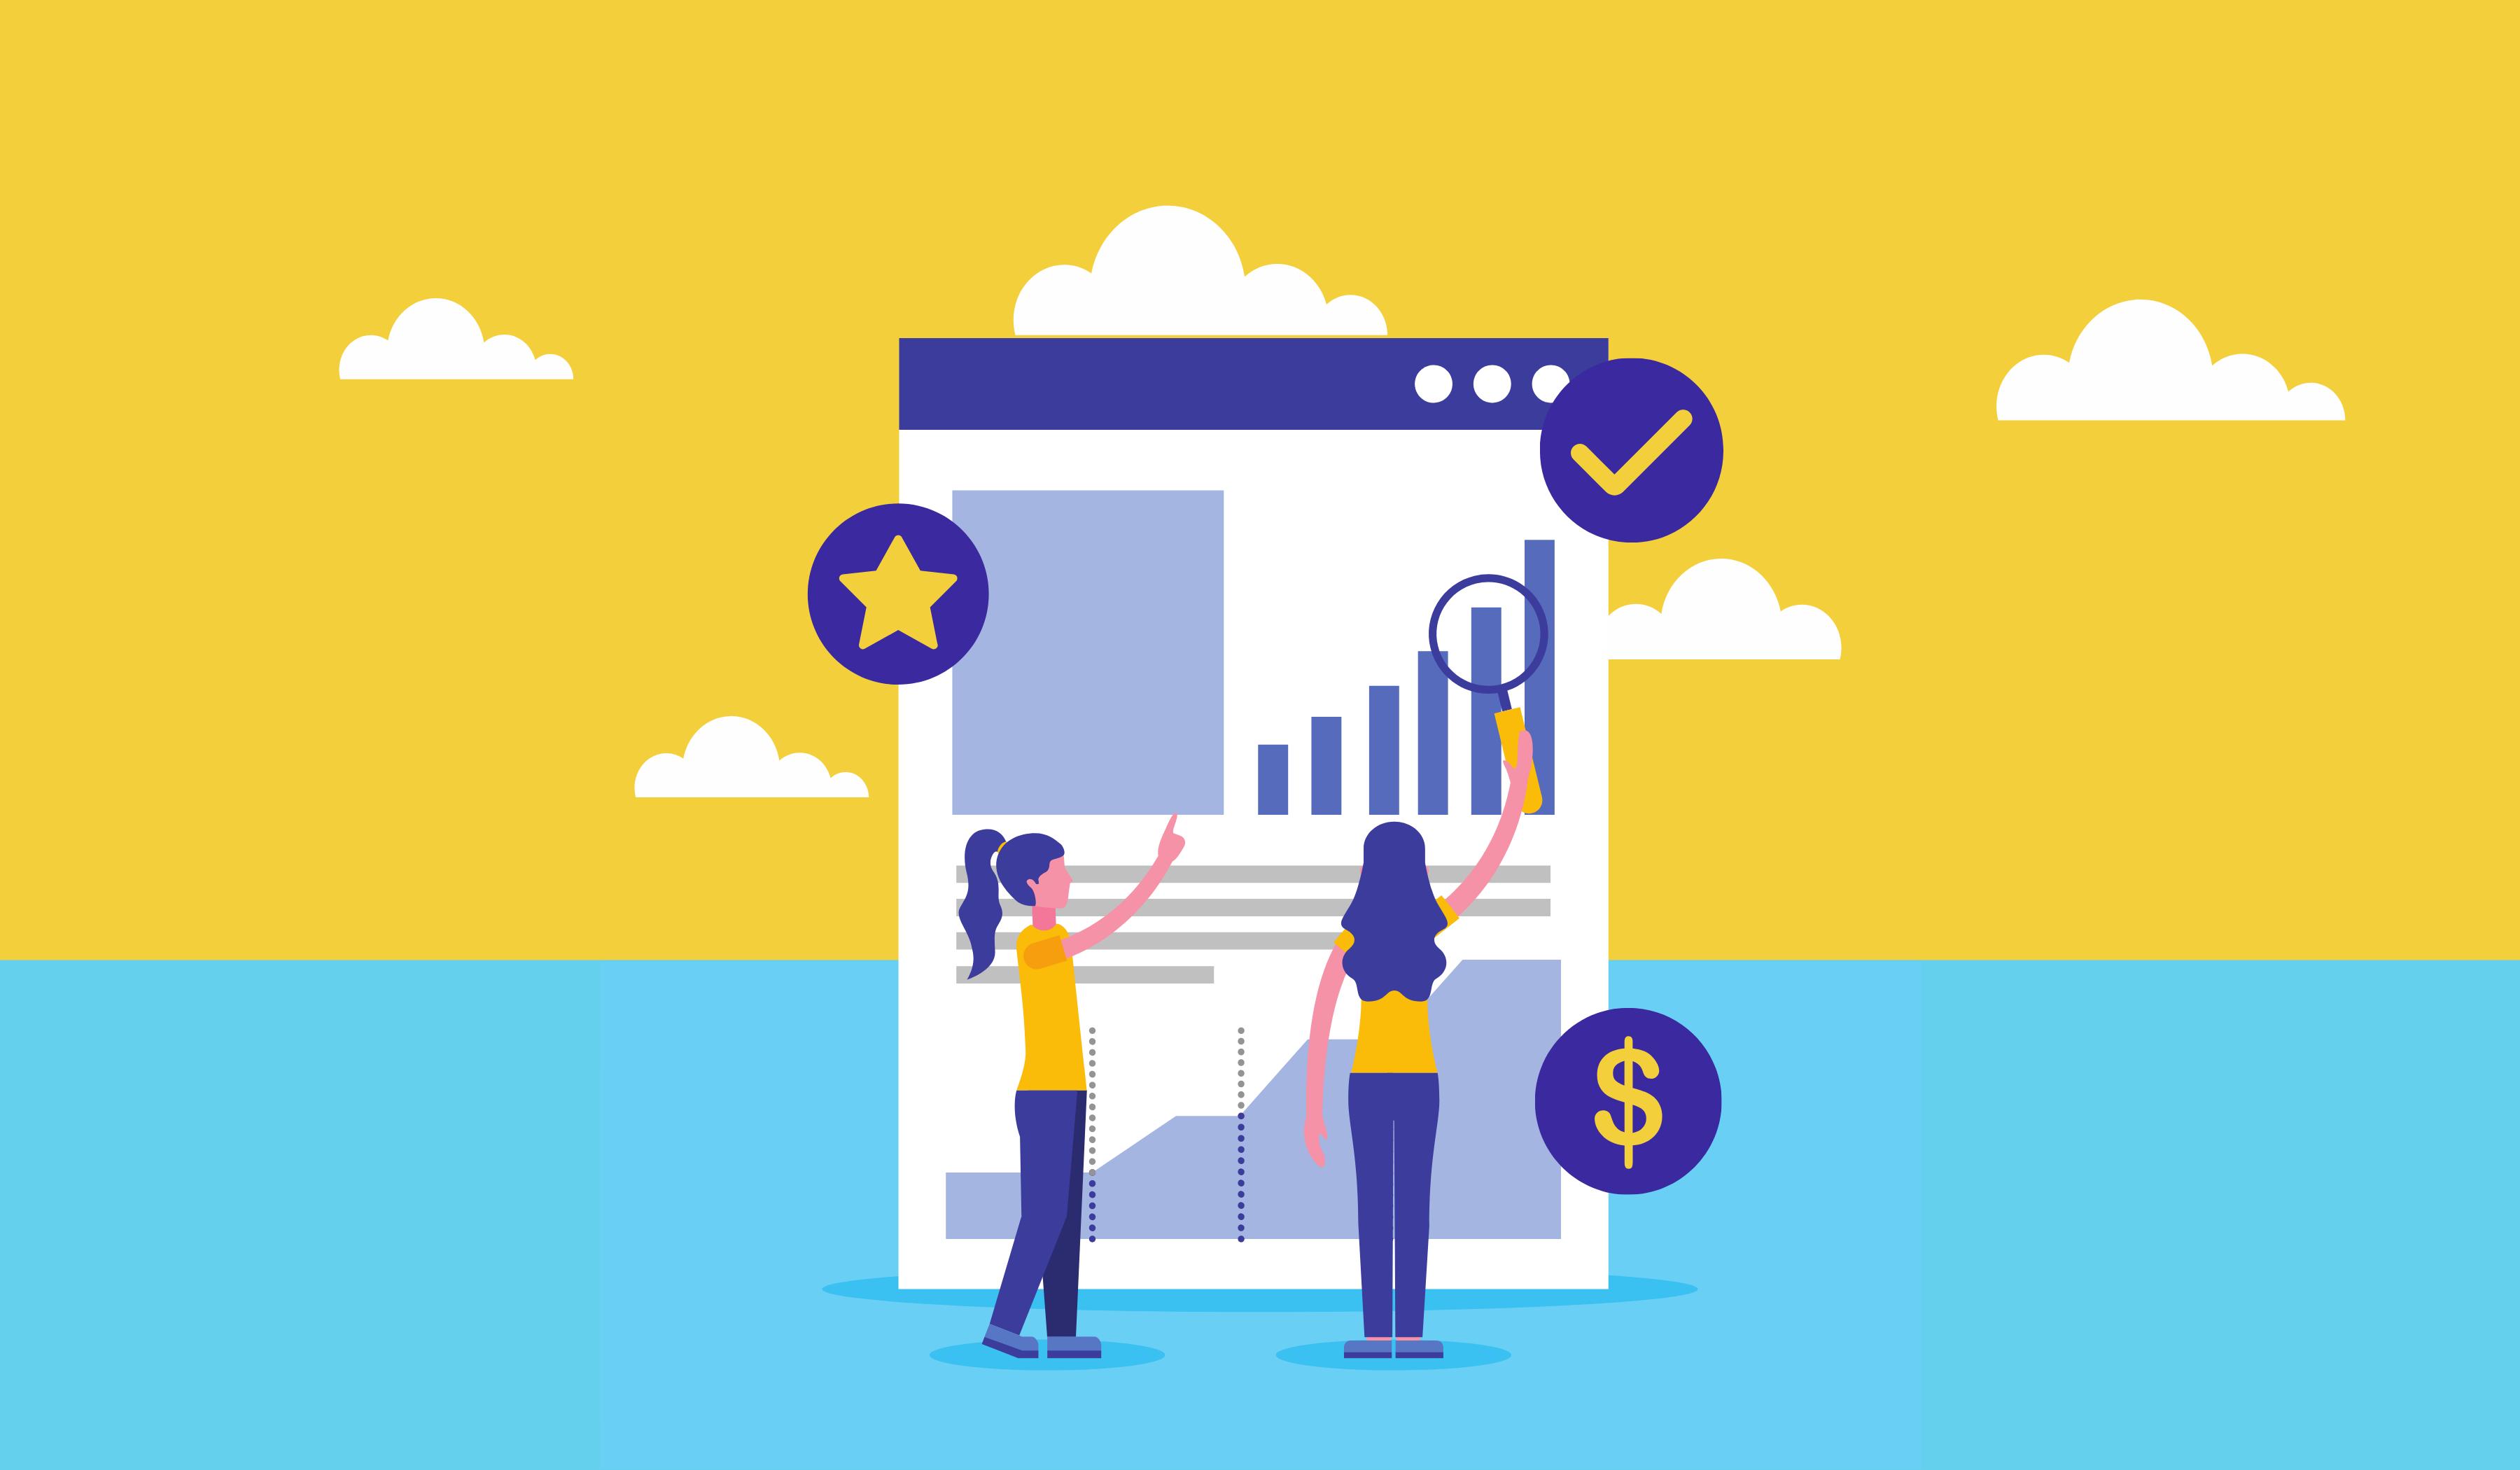 How to Measure Content Marketing Success Holistically